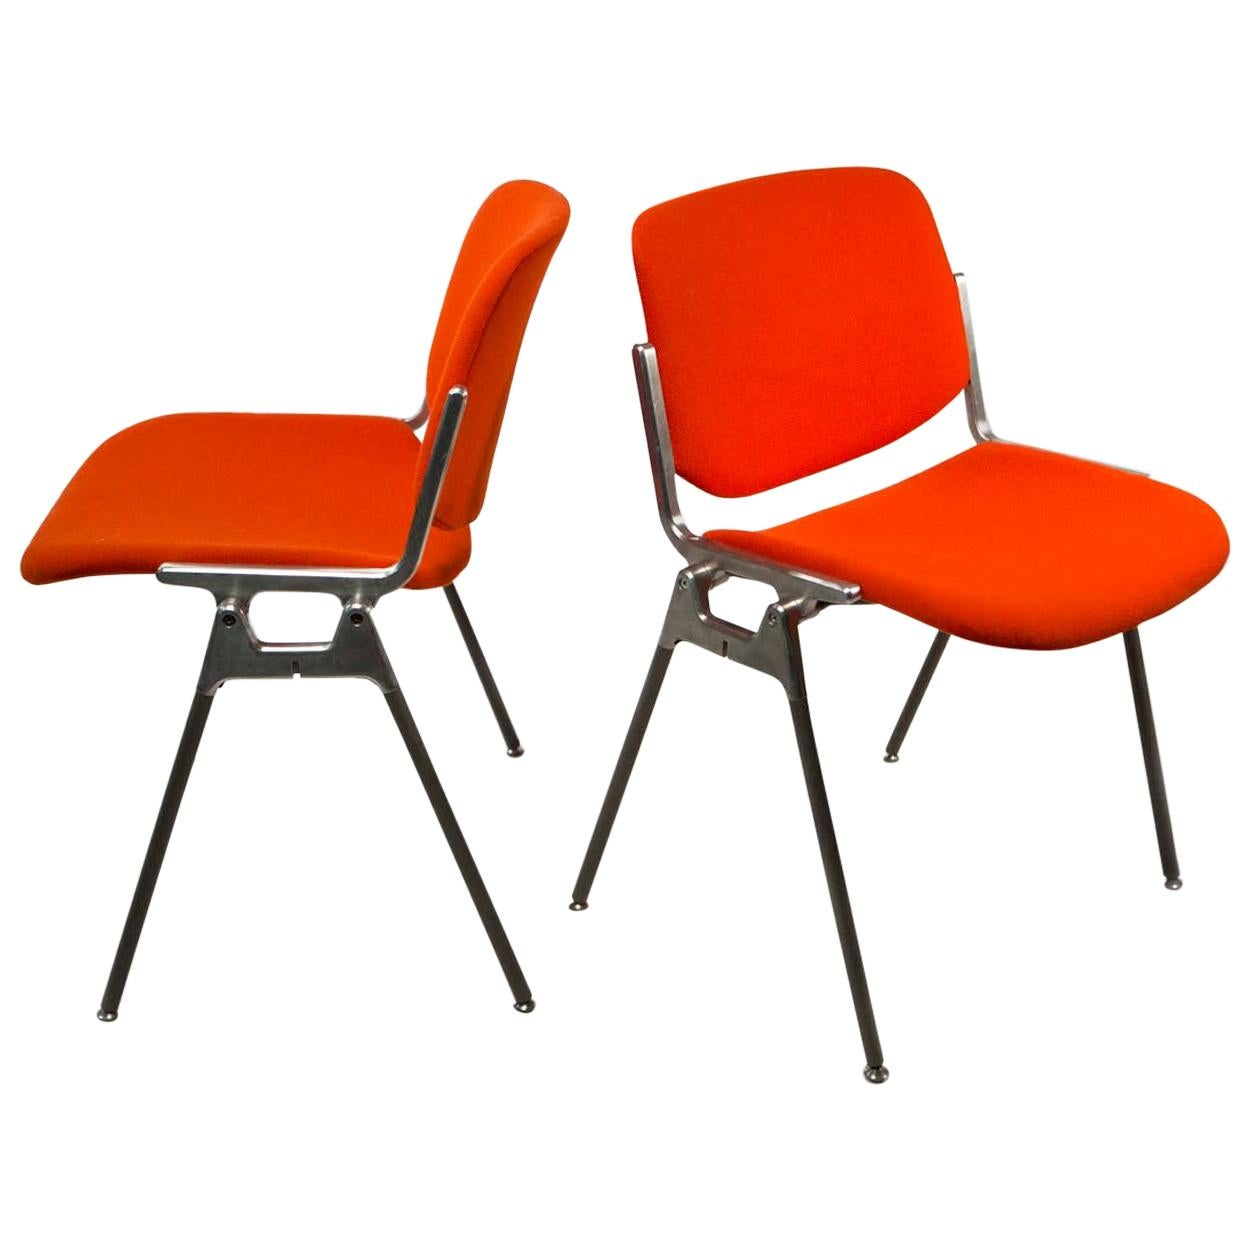 Giancarlo Piretti, DSC 106 Pair of Italian Stacking Chairs for Castelli, 1960s